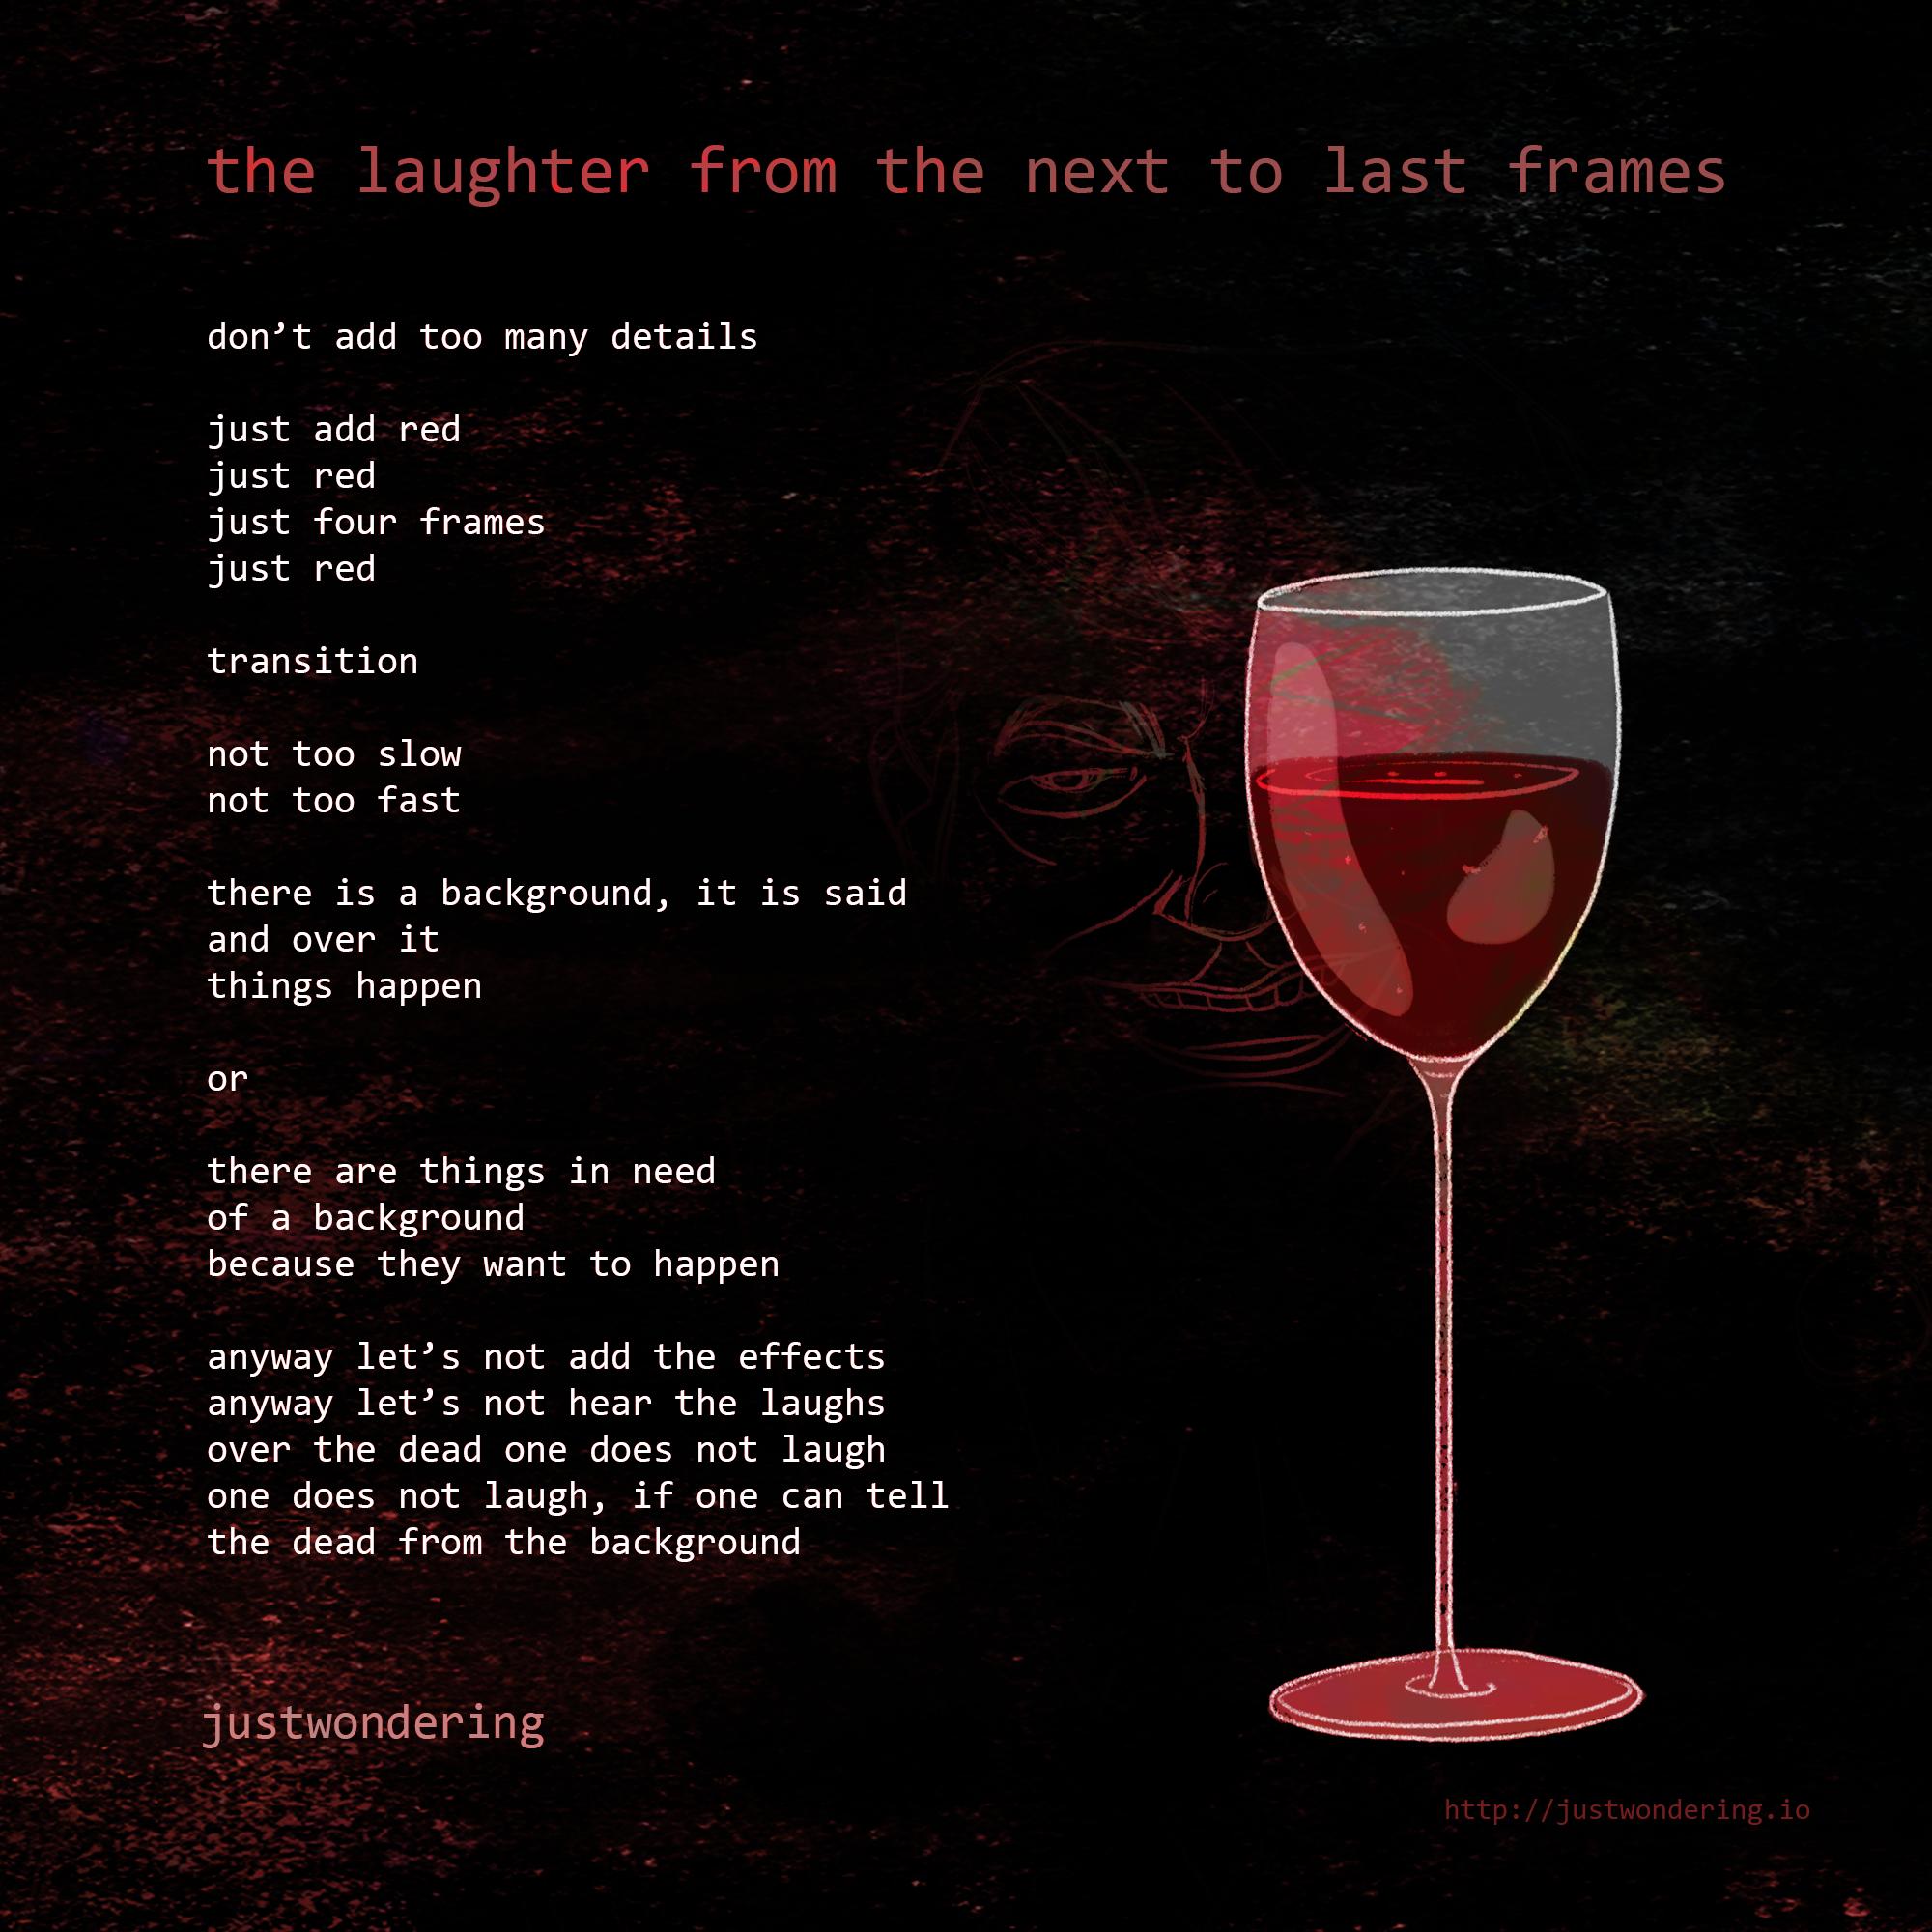 Poem-The last frames